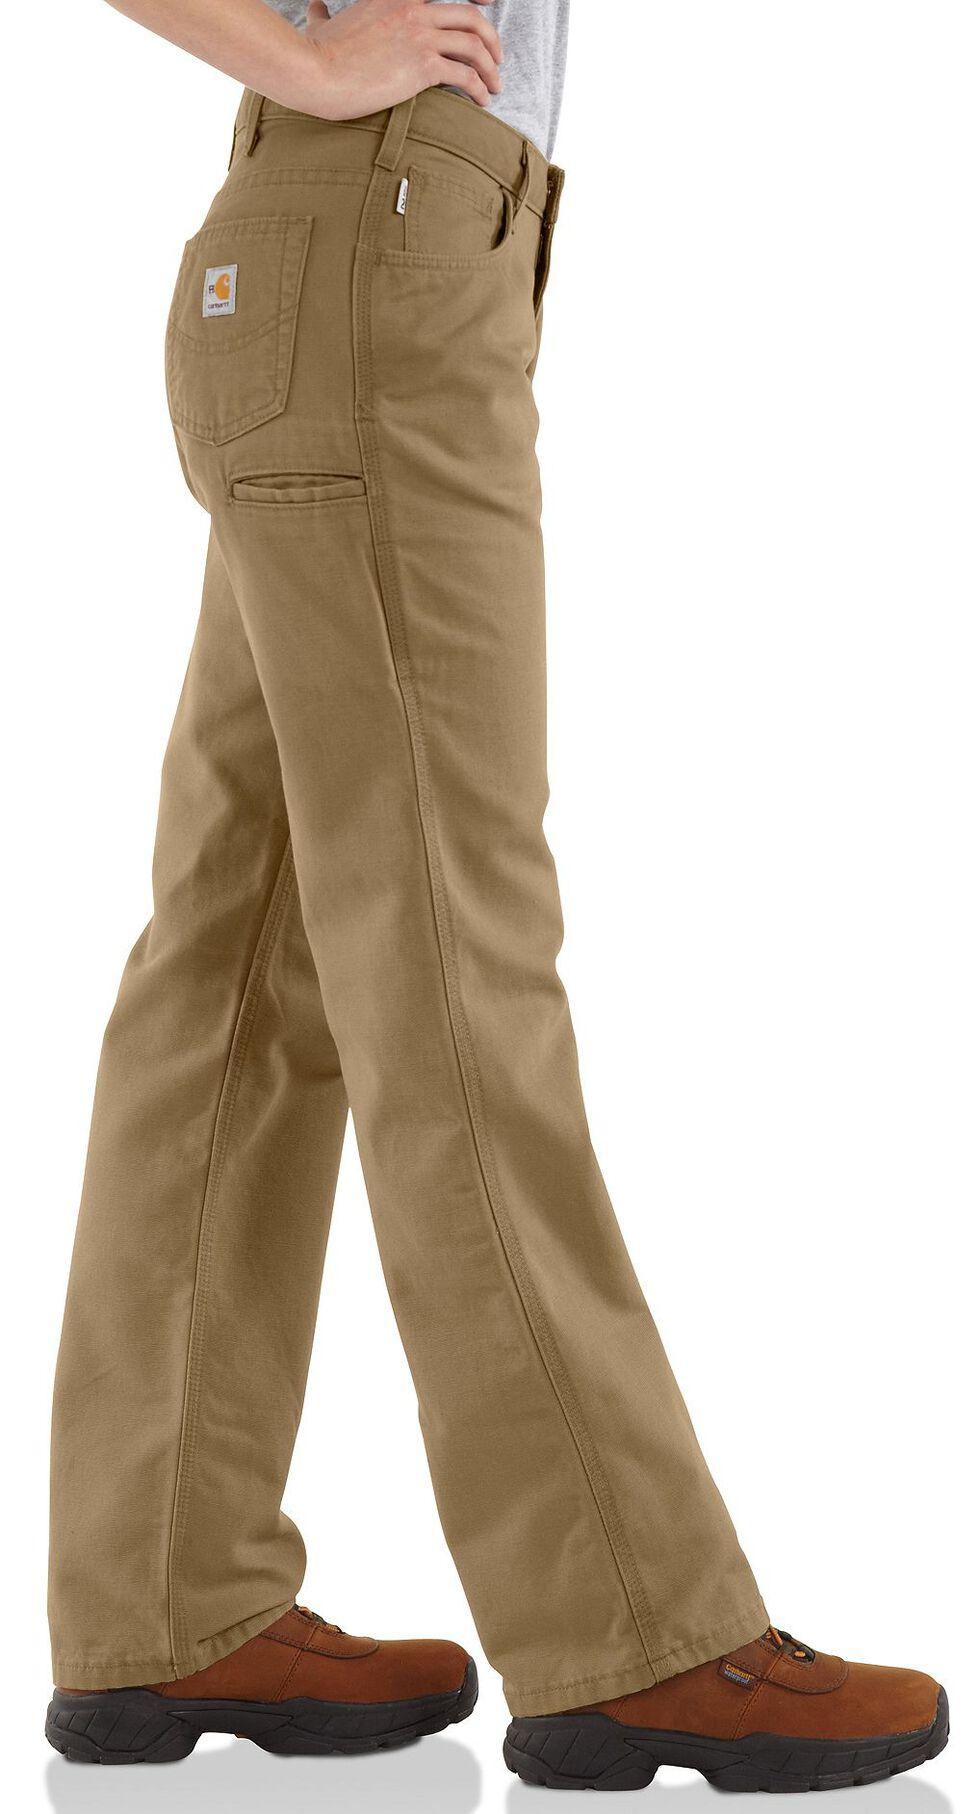 "Carhartt Flame Resistant Canvas Work Pants - 30"" Inseam, Khaki, hi-res"